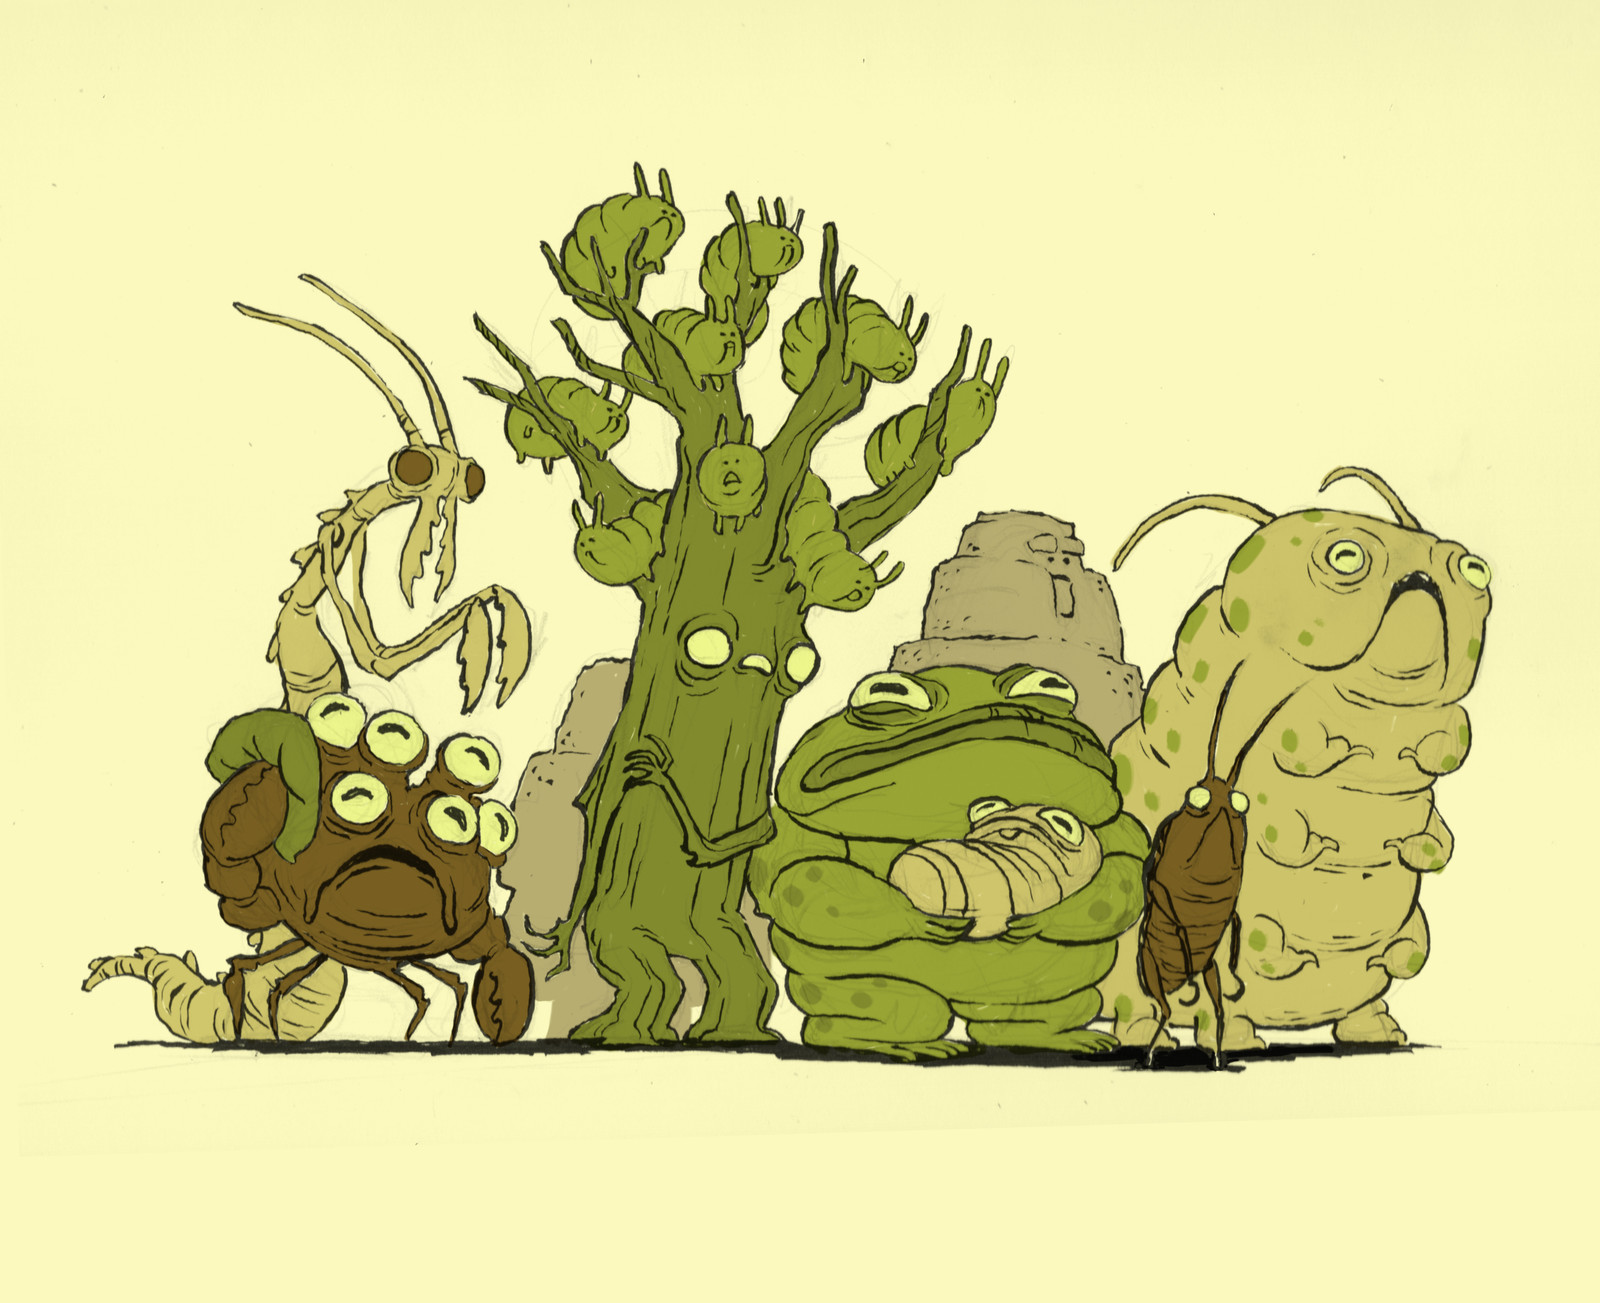 Sick Creatures